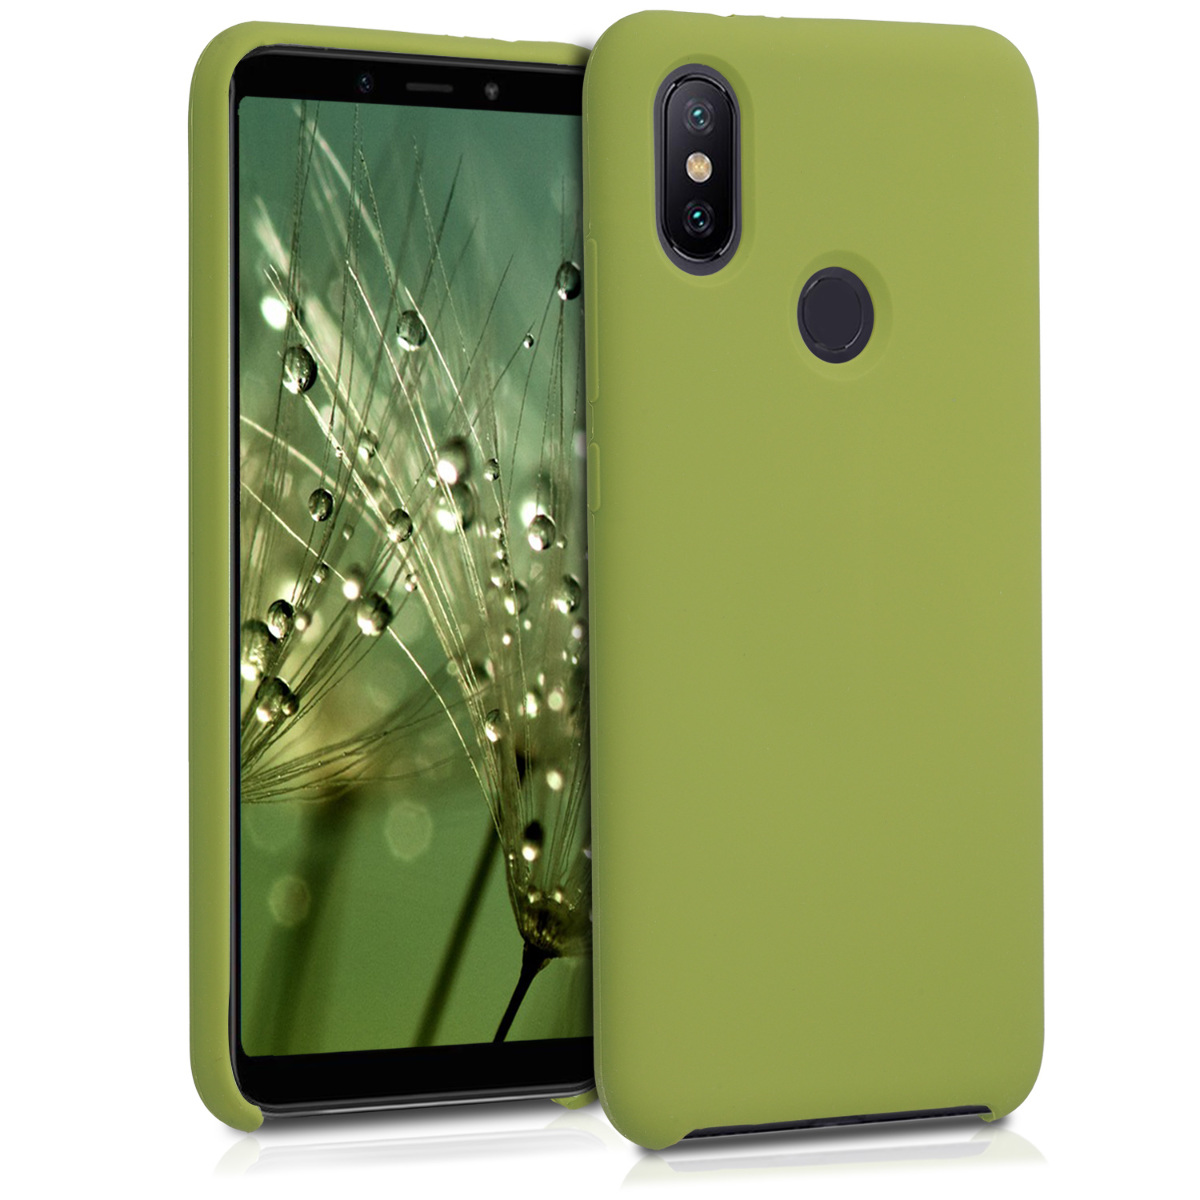 KW Θήκη Σιλικόνης Xiaomi Mi 6X / Mi A2 - Pale Olive Green (47733.148)